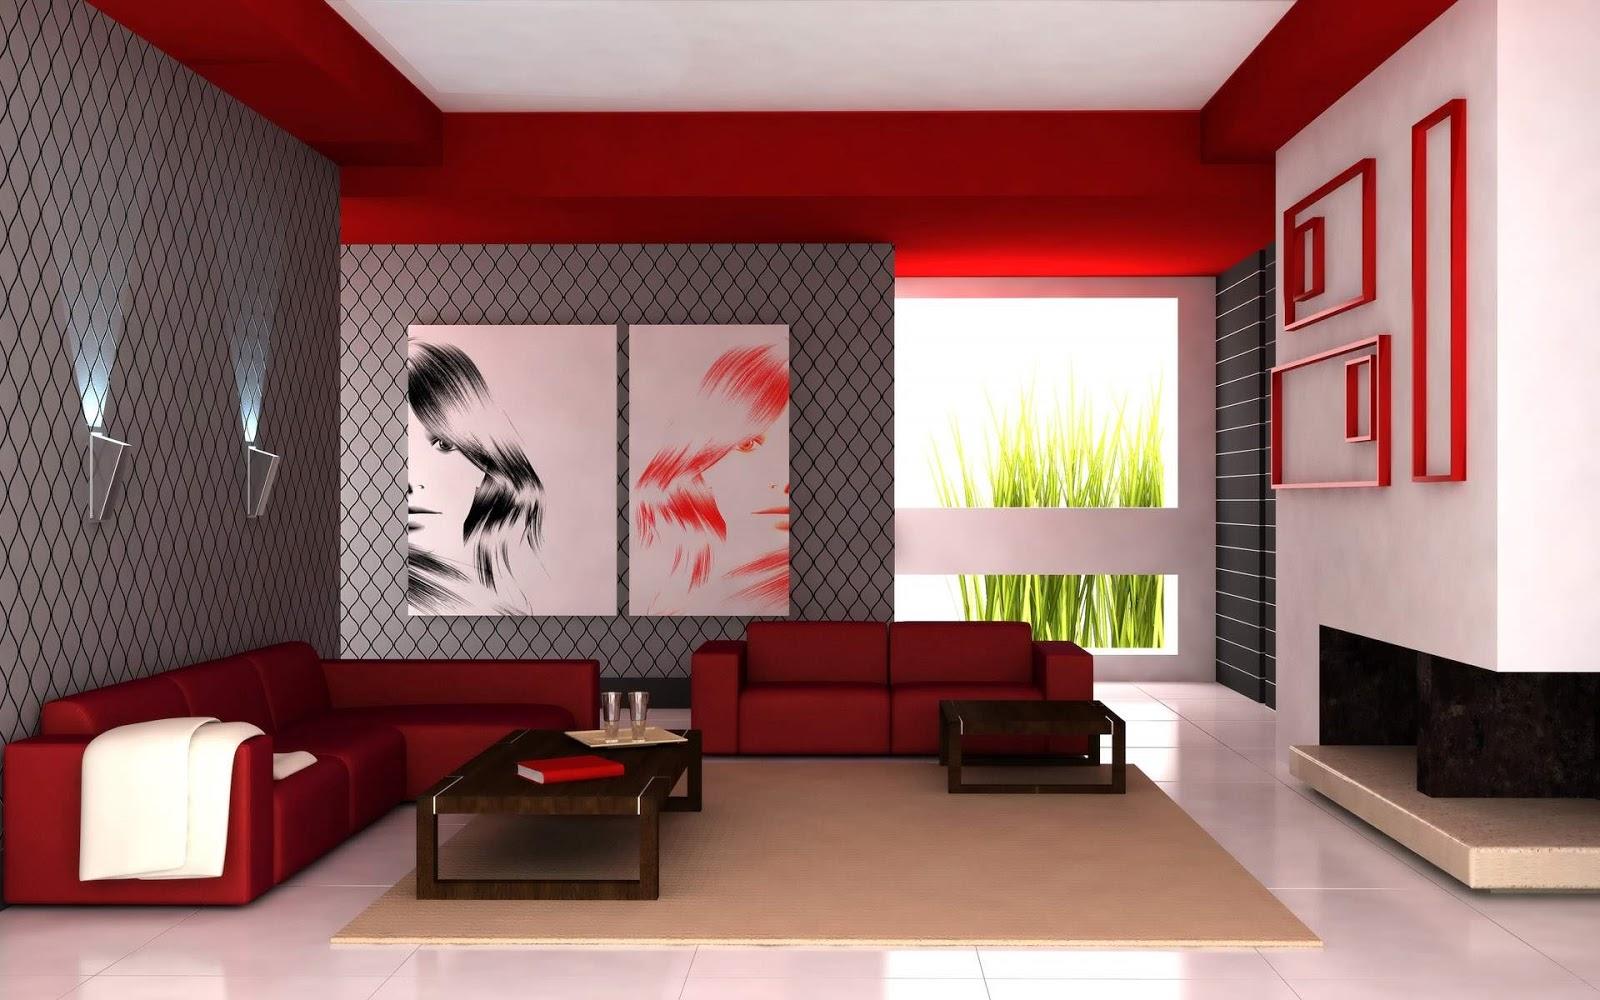 Decoraci n de interiores decoraci n de interiores de - Pinturas modernas para sala ...